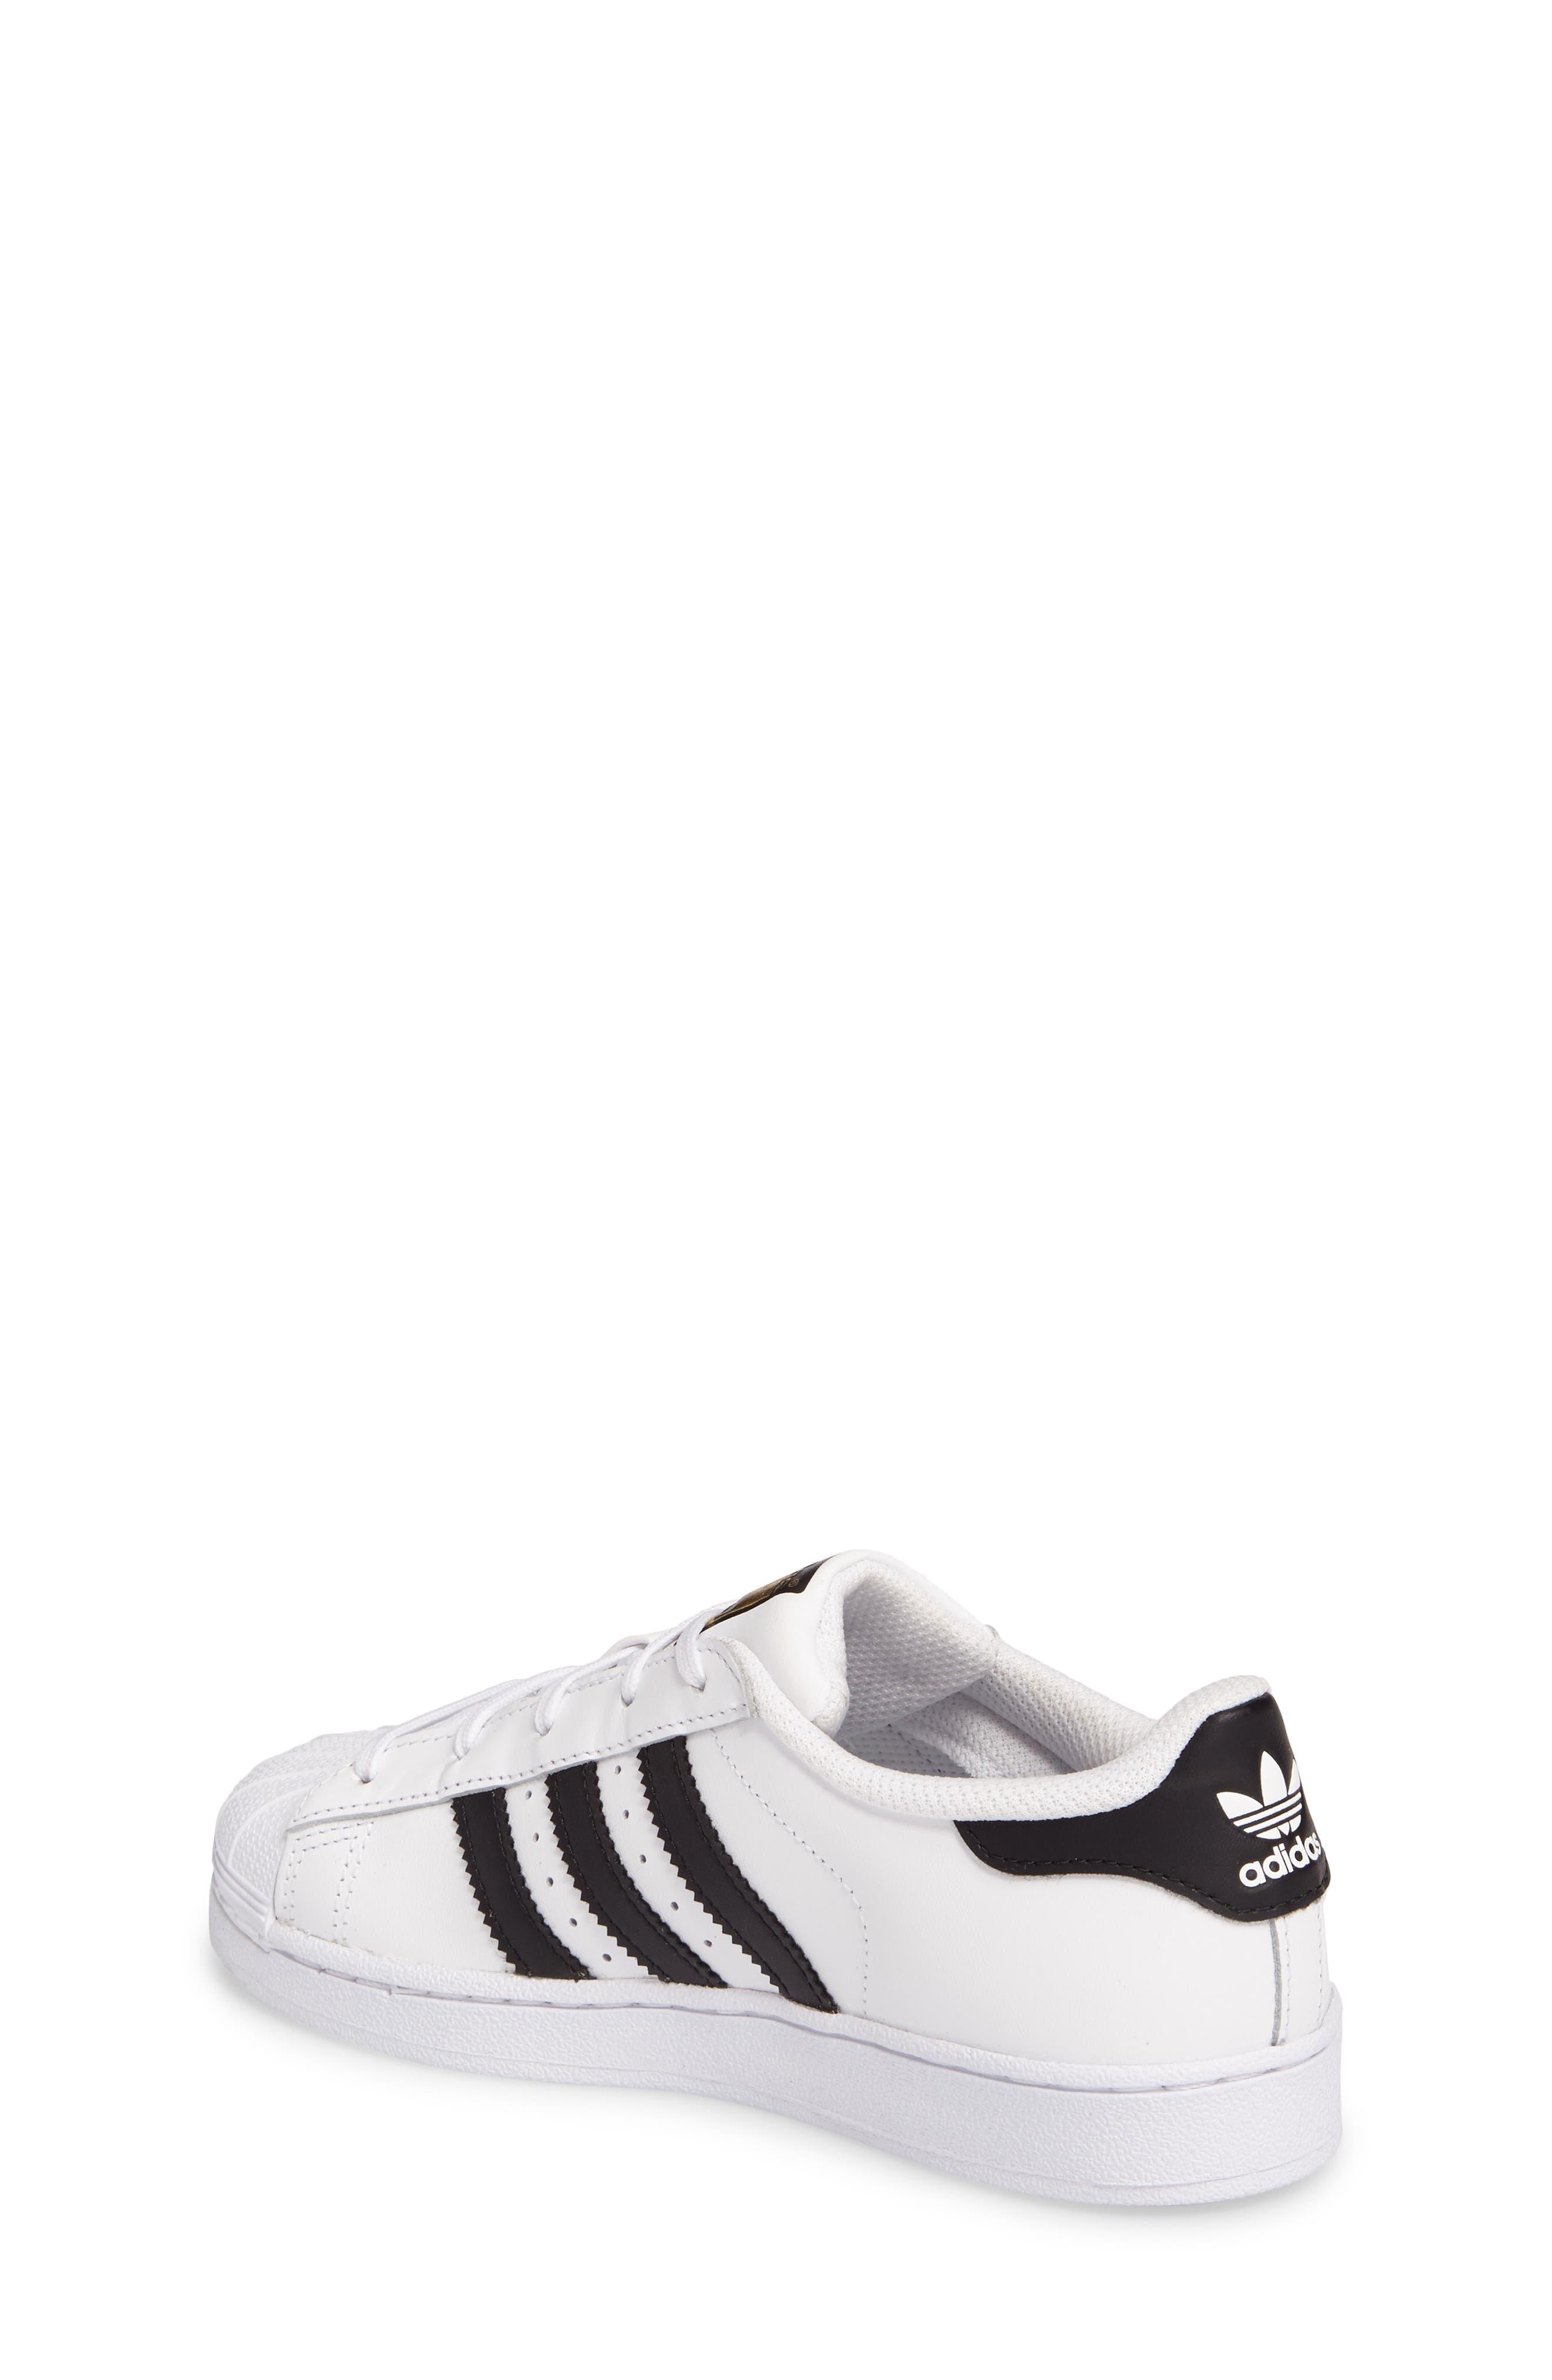 'Superstar Foundation' Sneaker,                             Alternate thumbnail 2, color,                             100